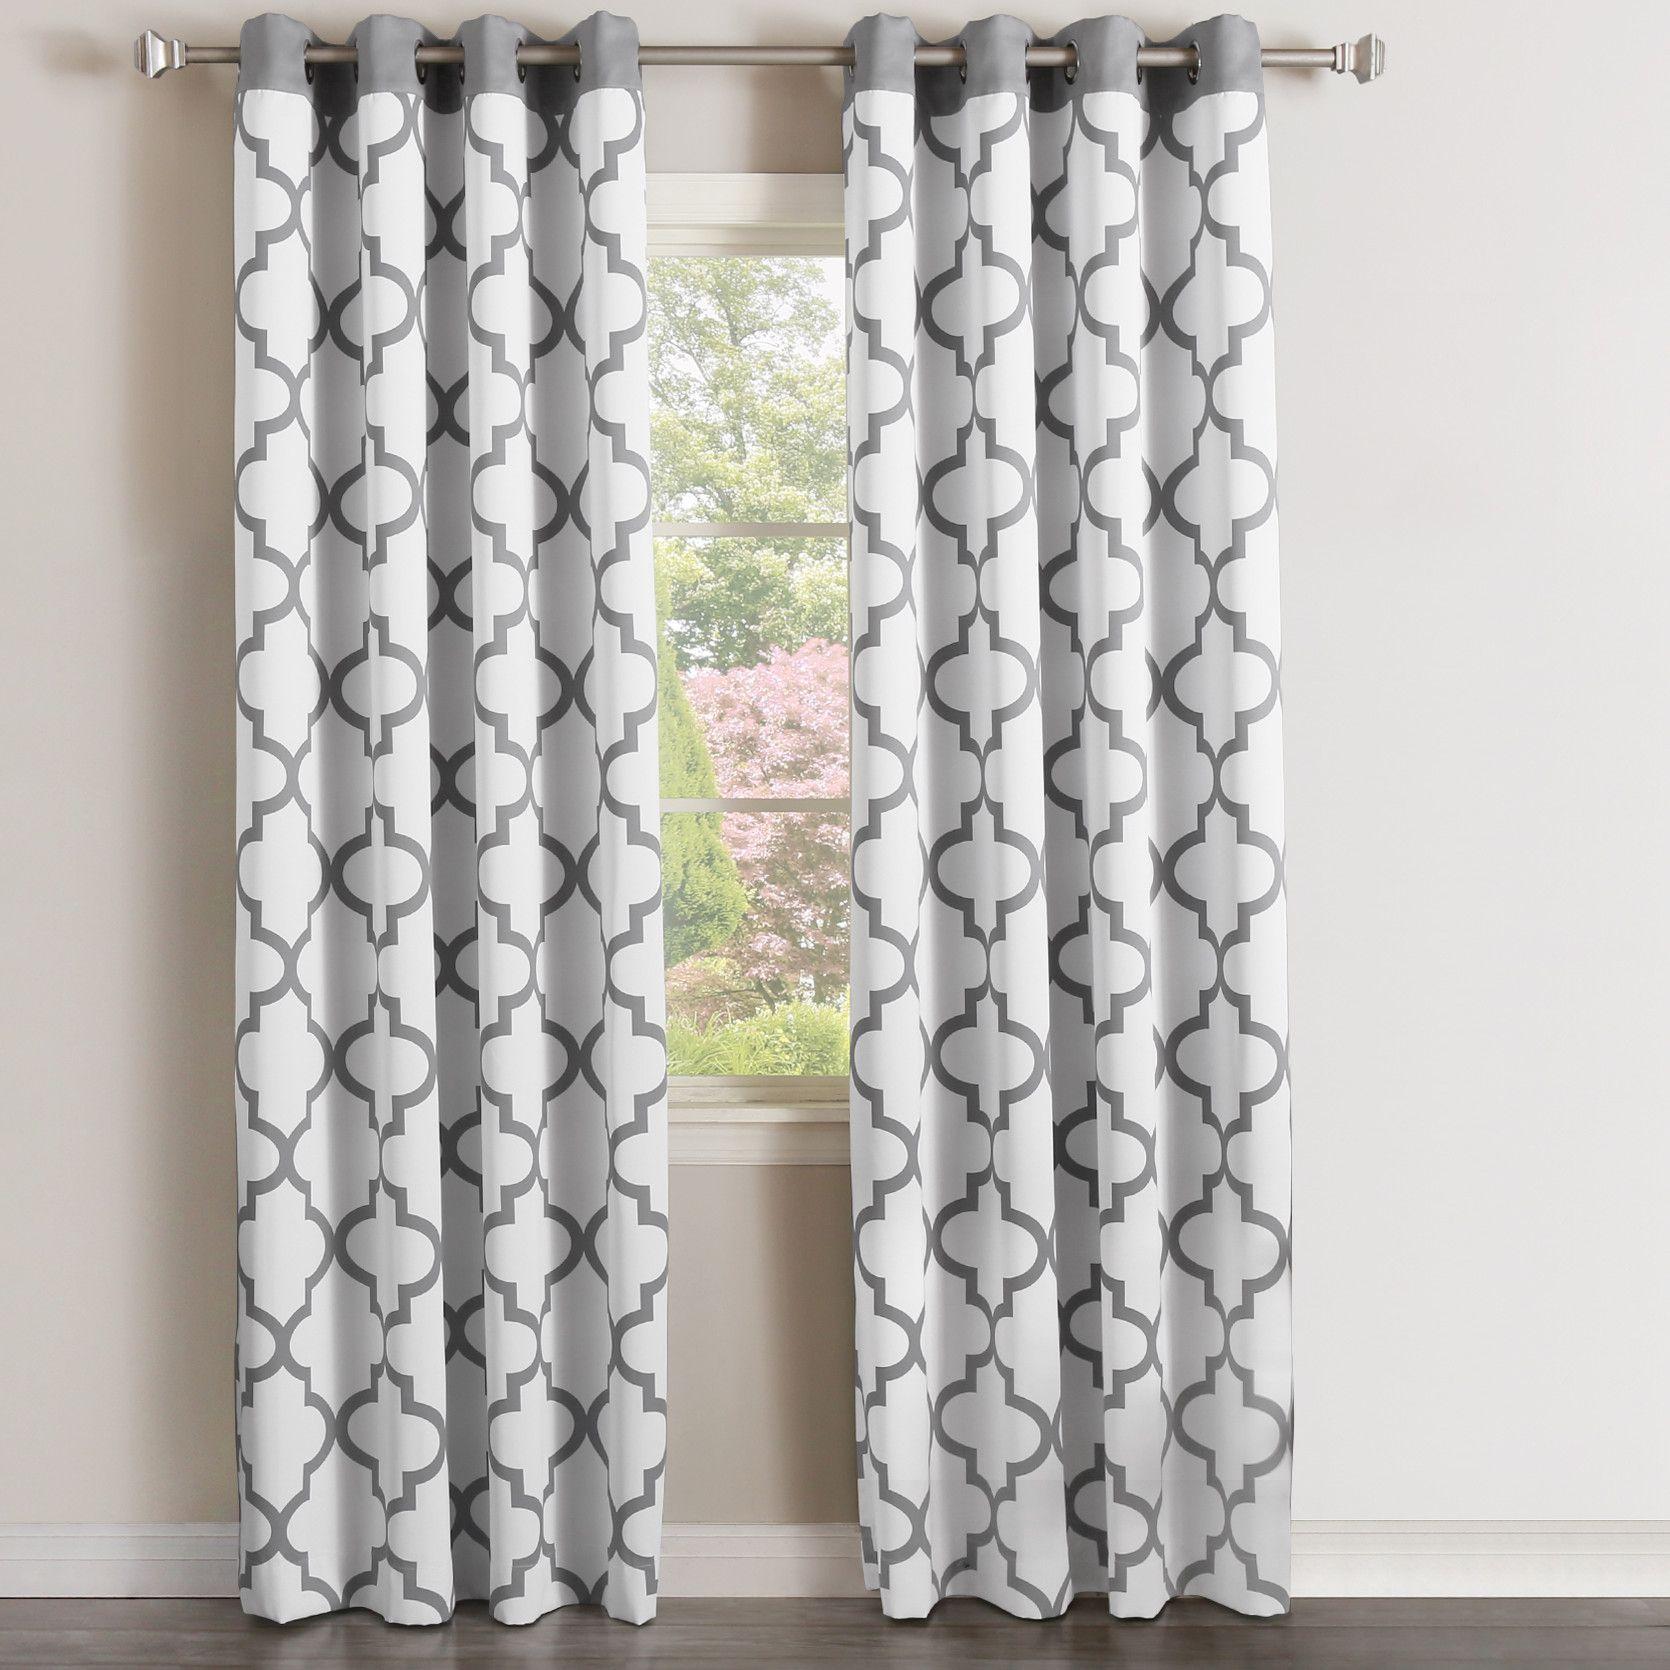 Moroccan Curtain Panel